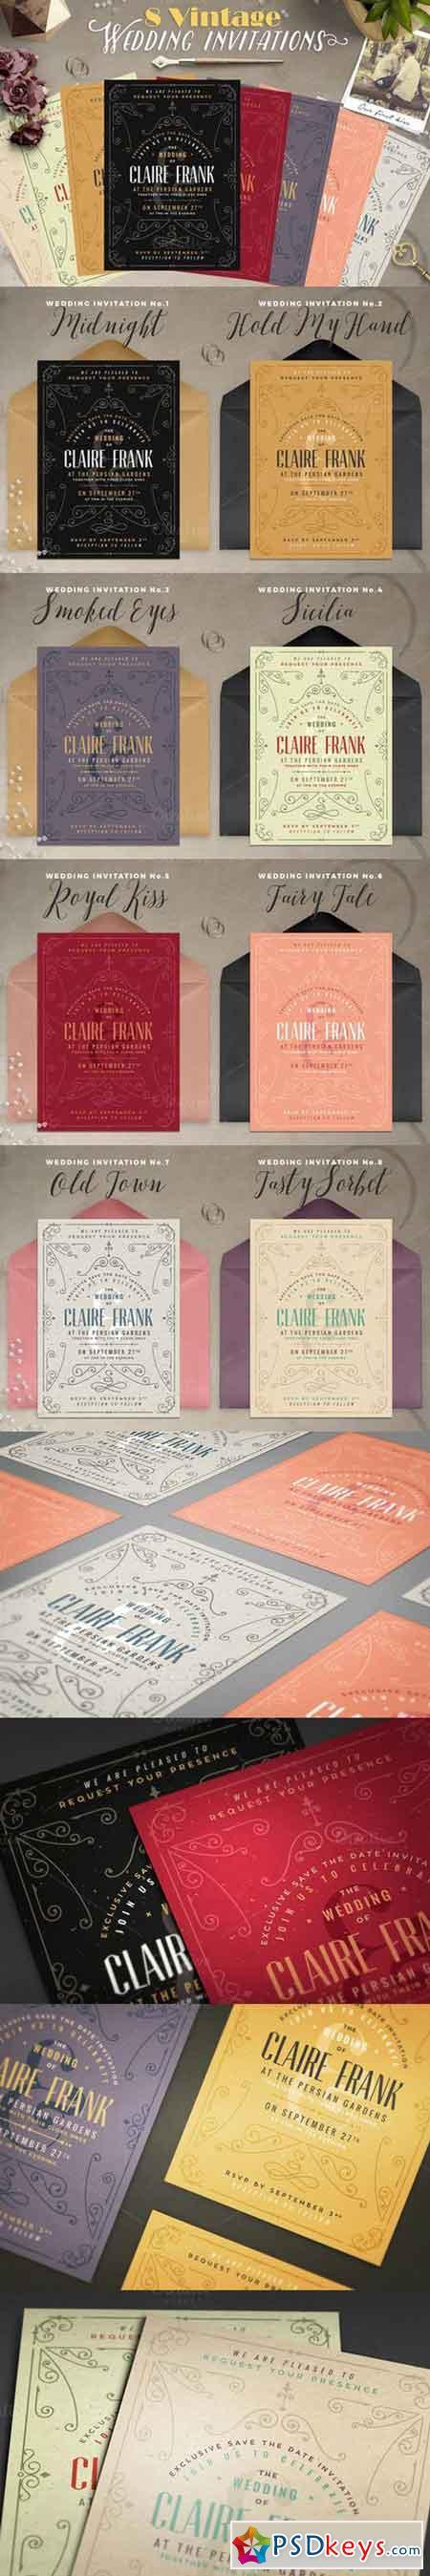 8 Vintage Deco Wedding Invites II 728564